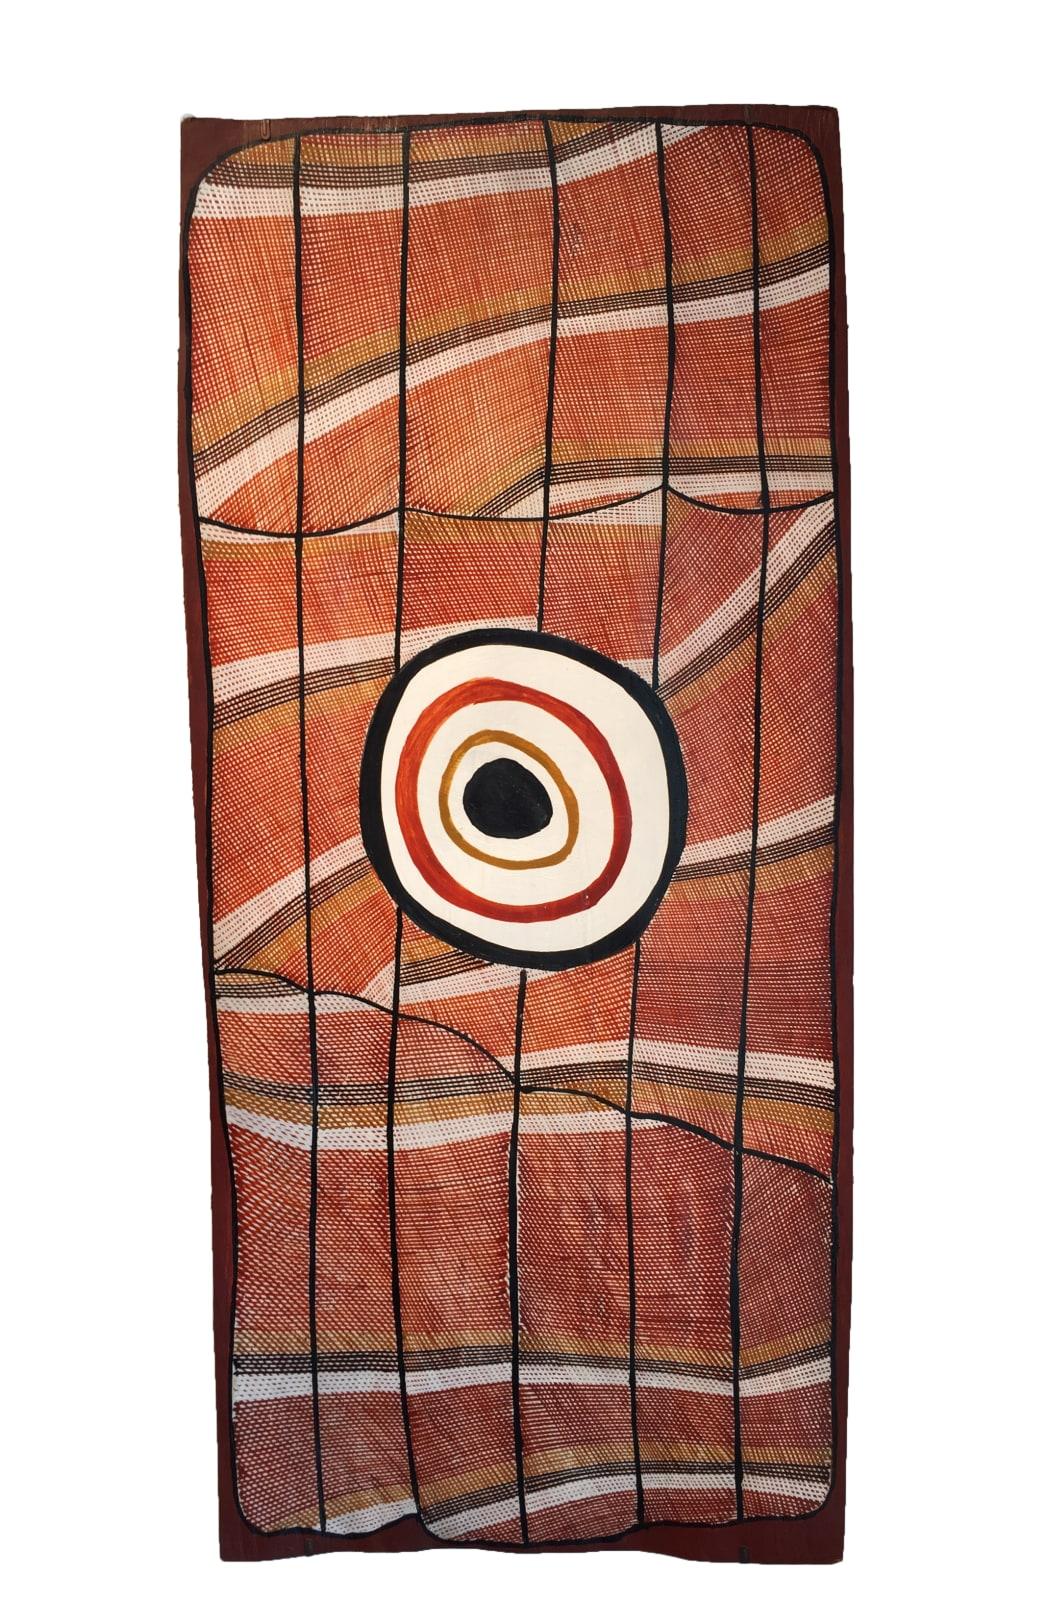 John Mawurndjul, Untitled, 2005